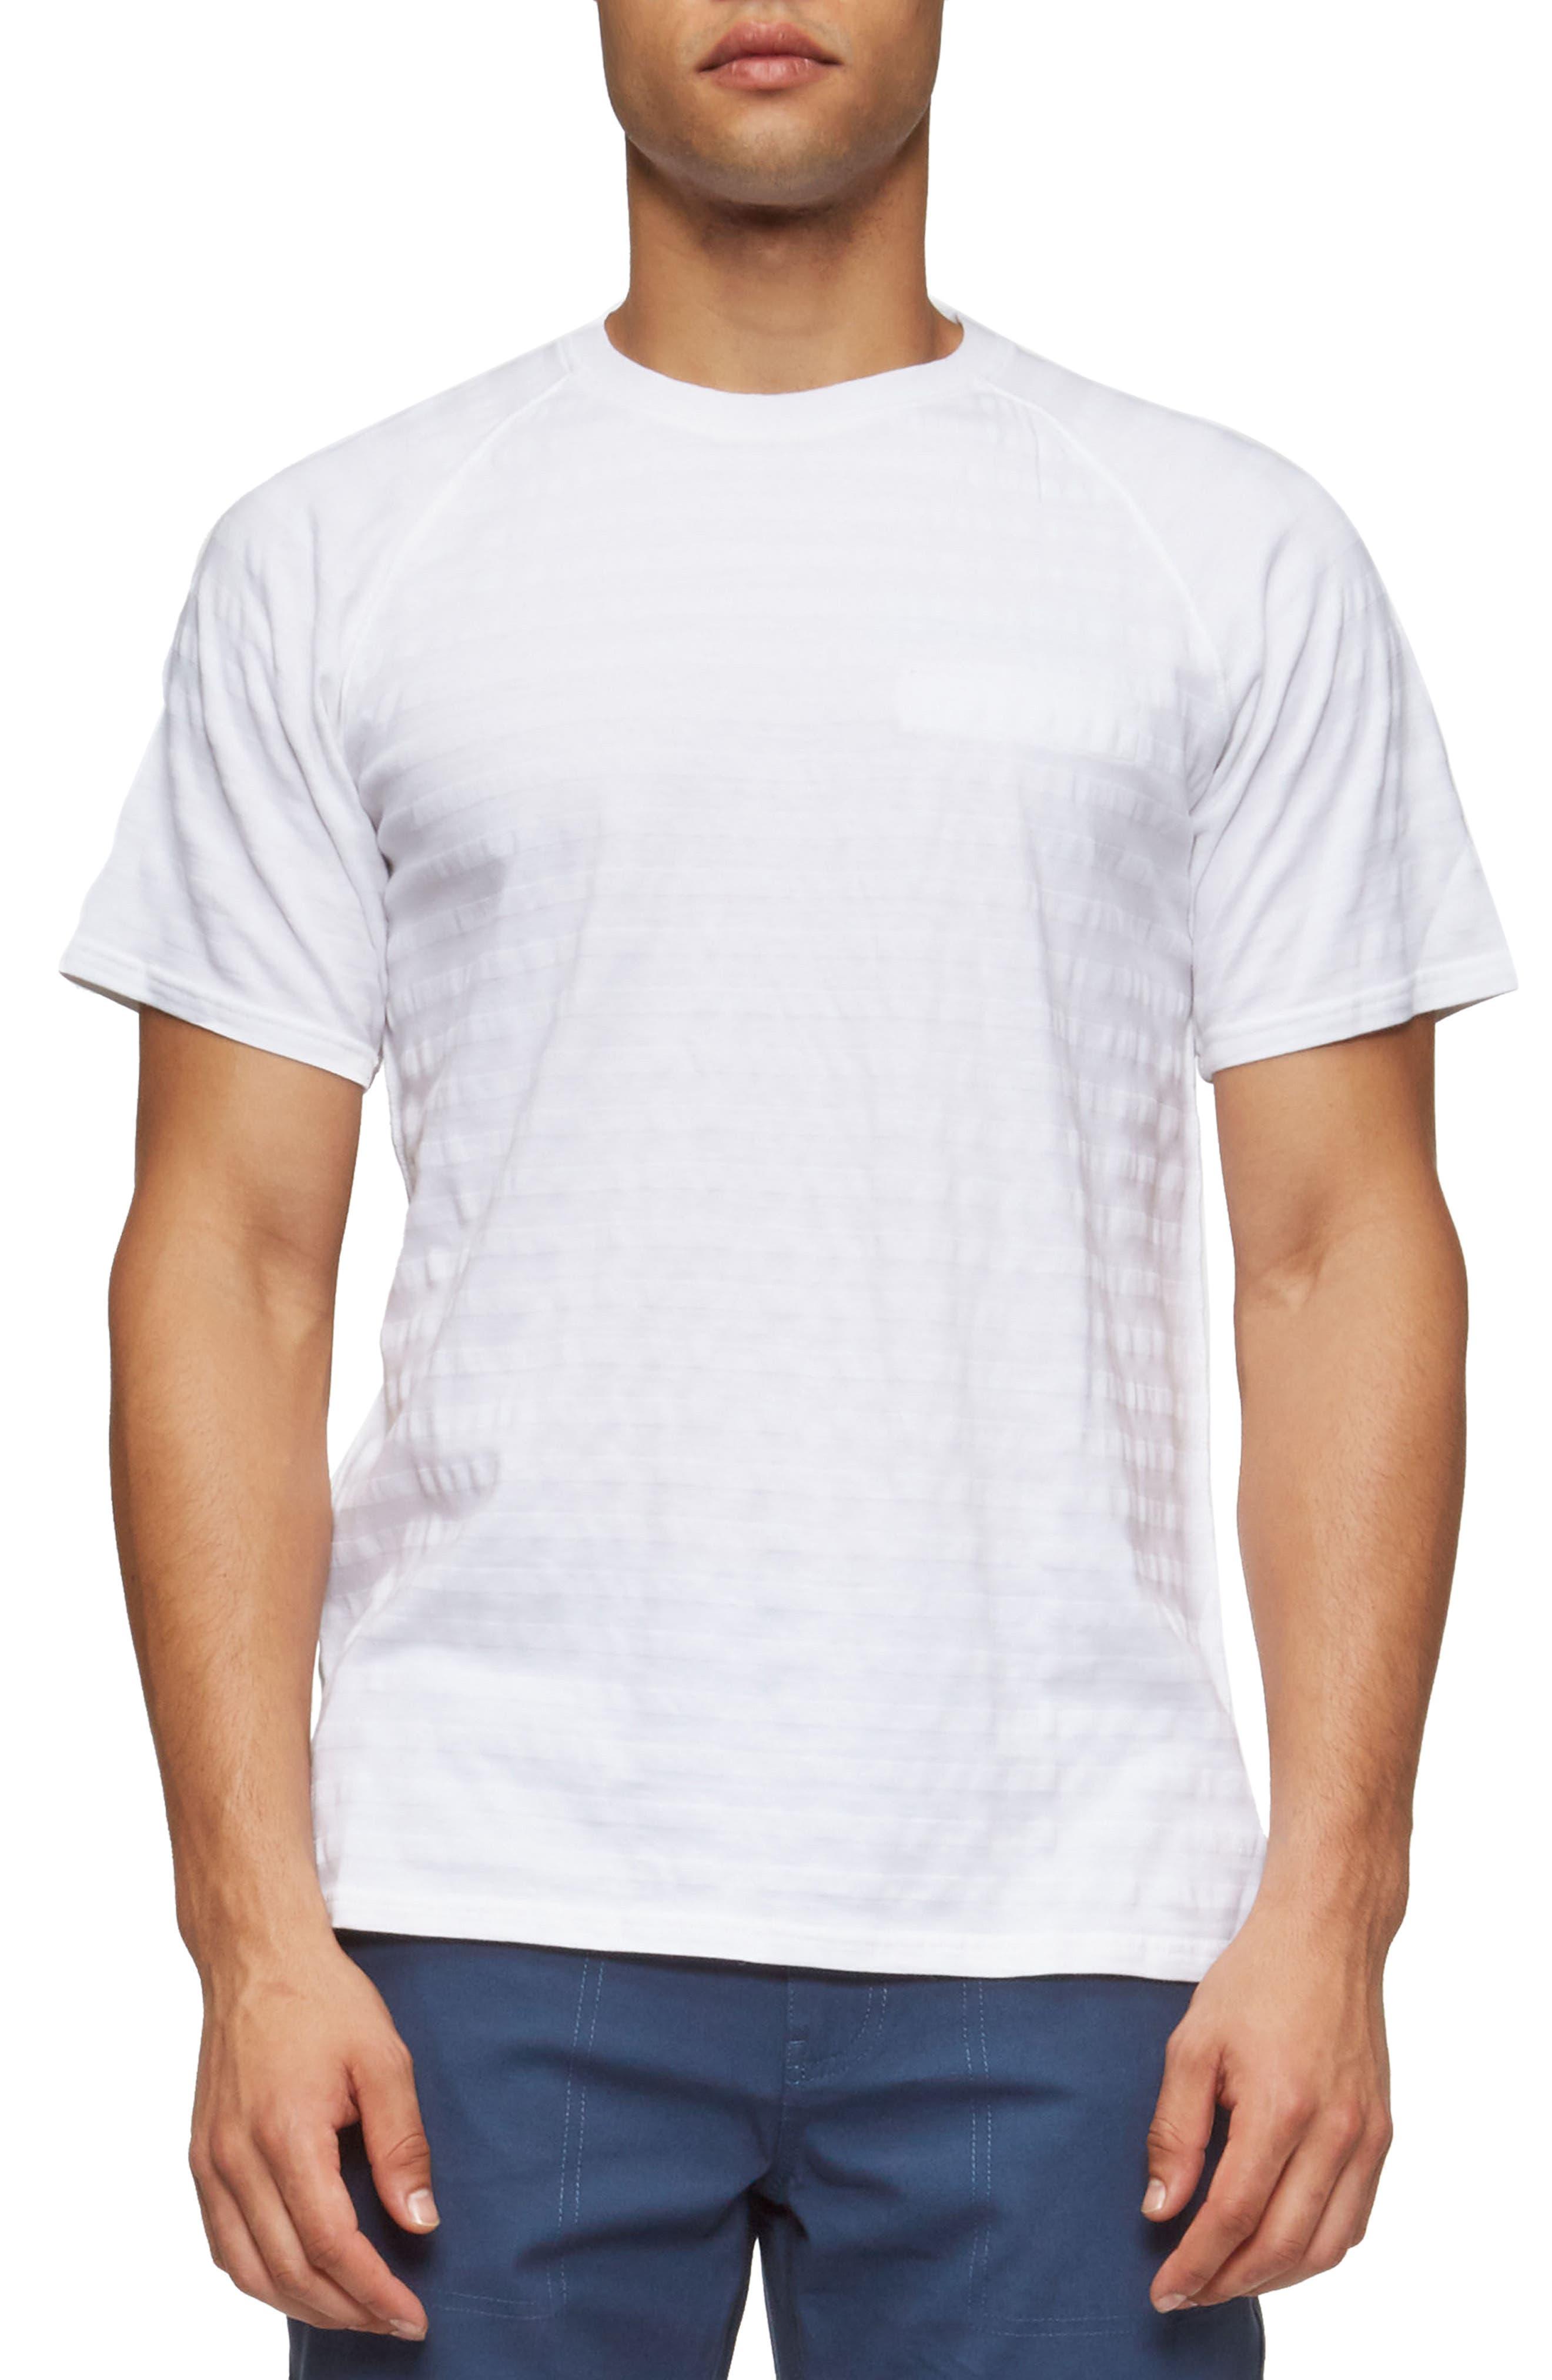 Modus T-Shirt,                             Main thumbnail 1, color,                             White